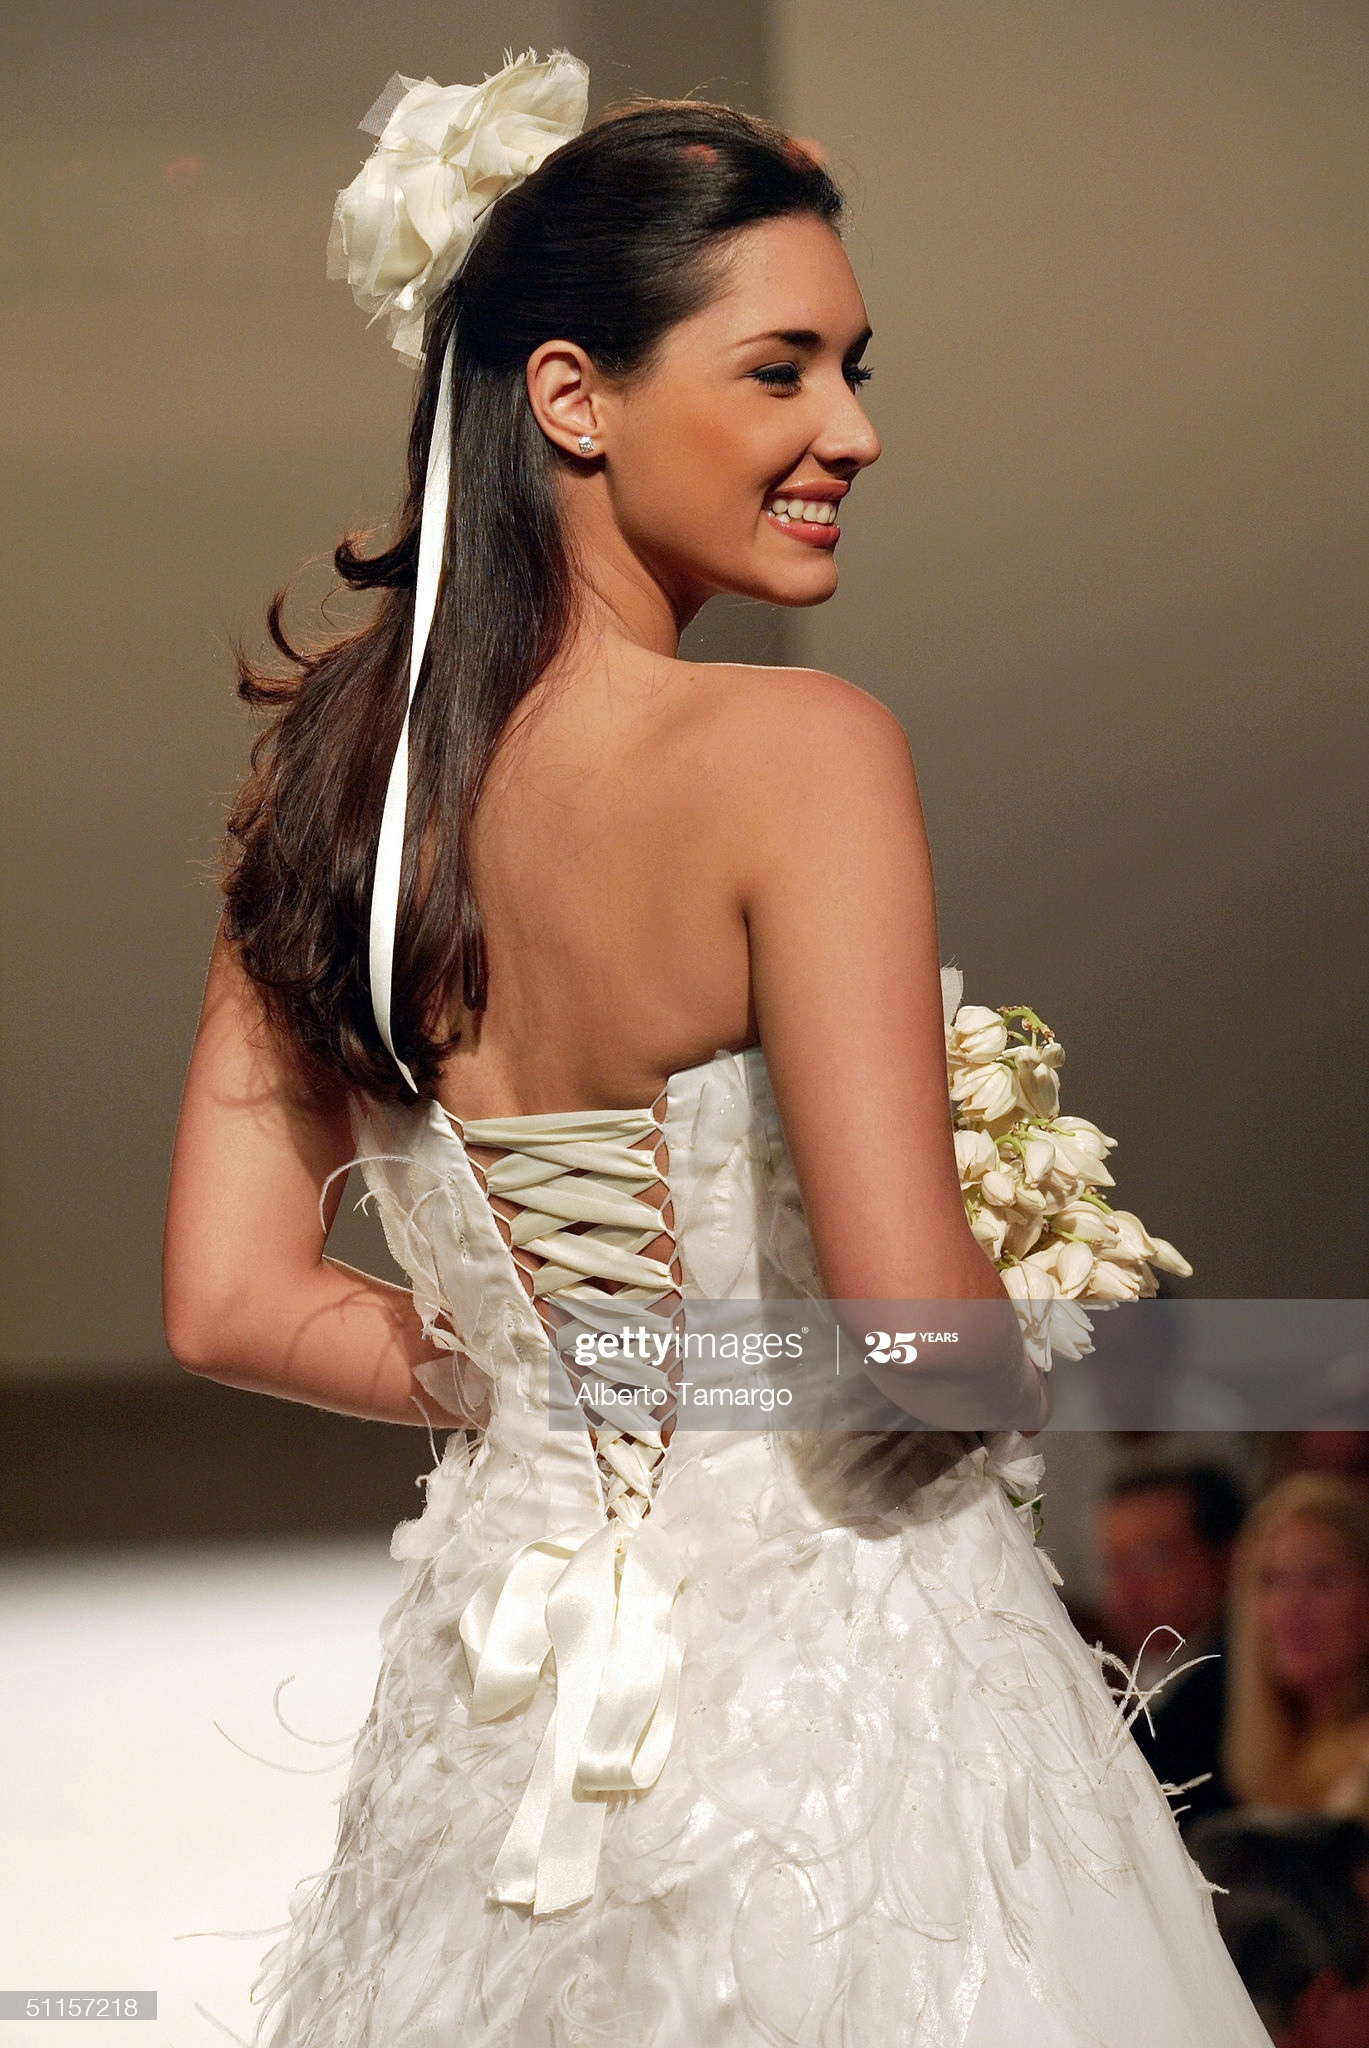 ════ ∘◦❁◦∘ ════ Amelia Vega, Miss Universe 2003. ════ ∘◦❁◦∘ ════ - Página 14 Former14